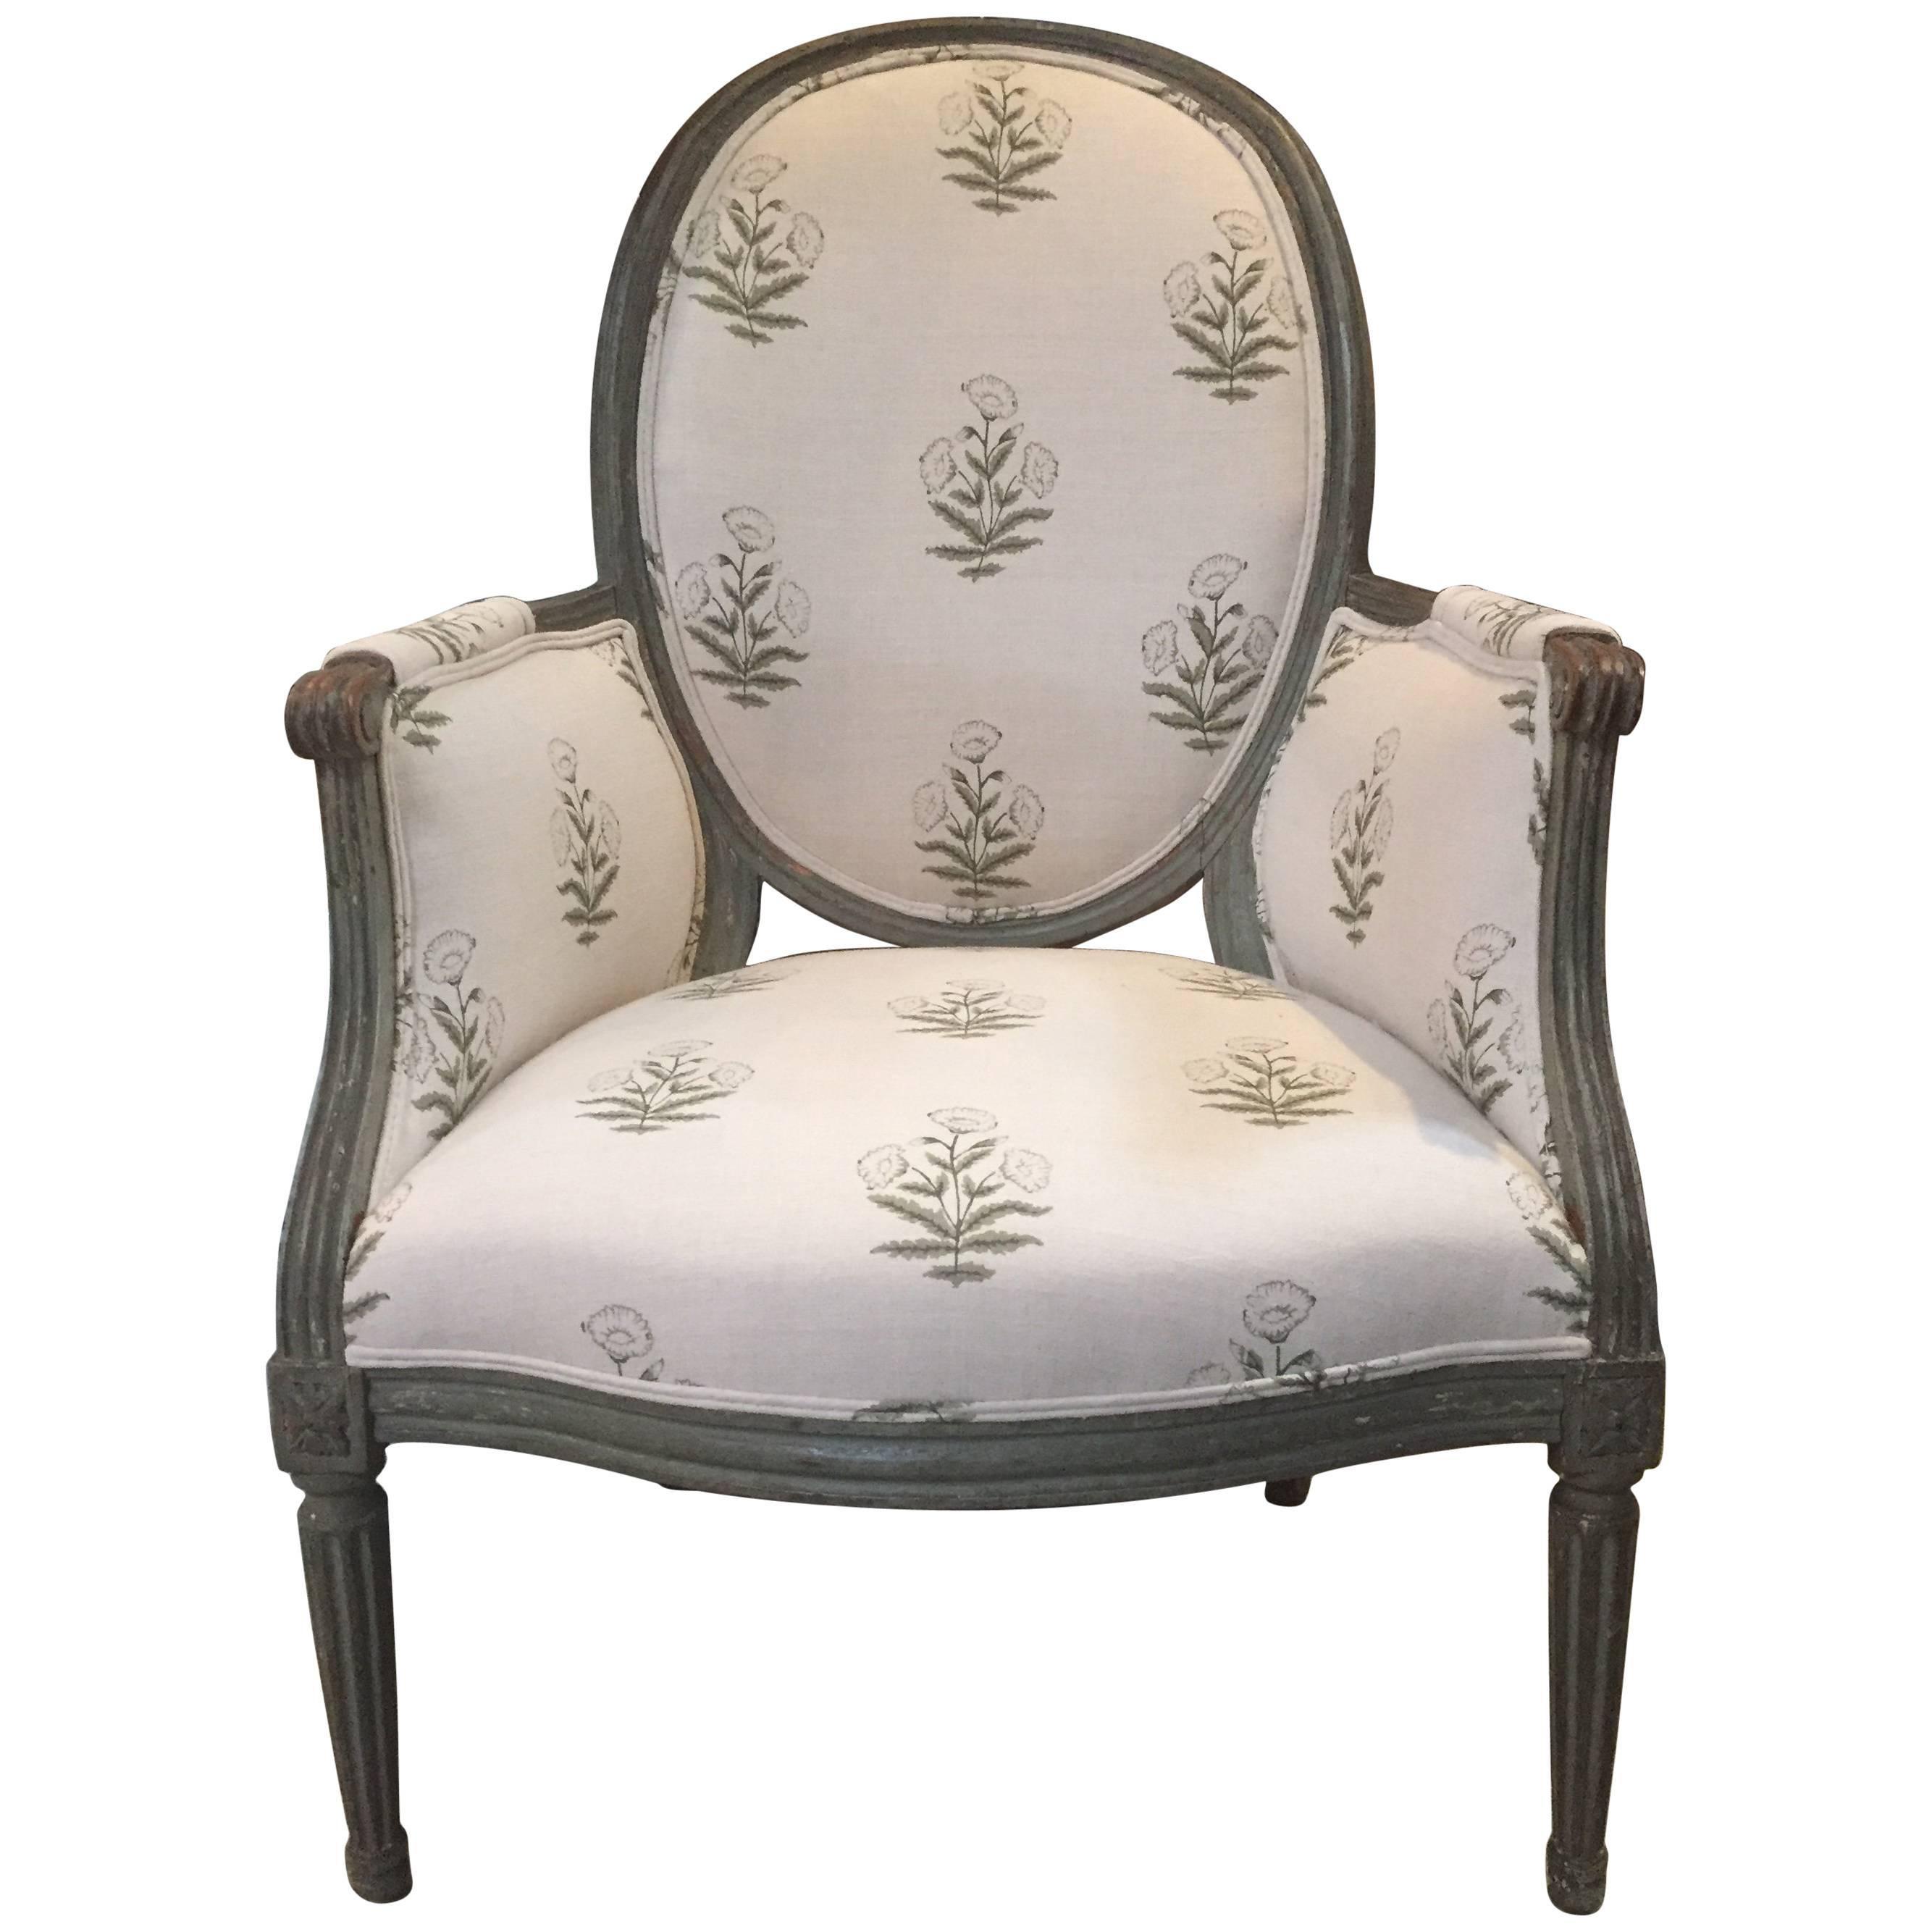 19th Century Louis XVI Bergere